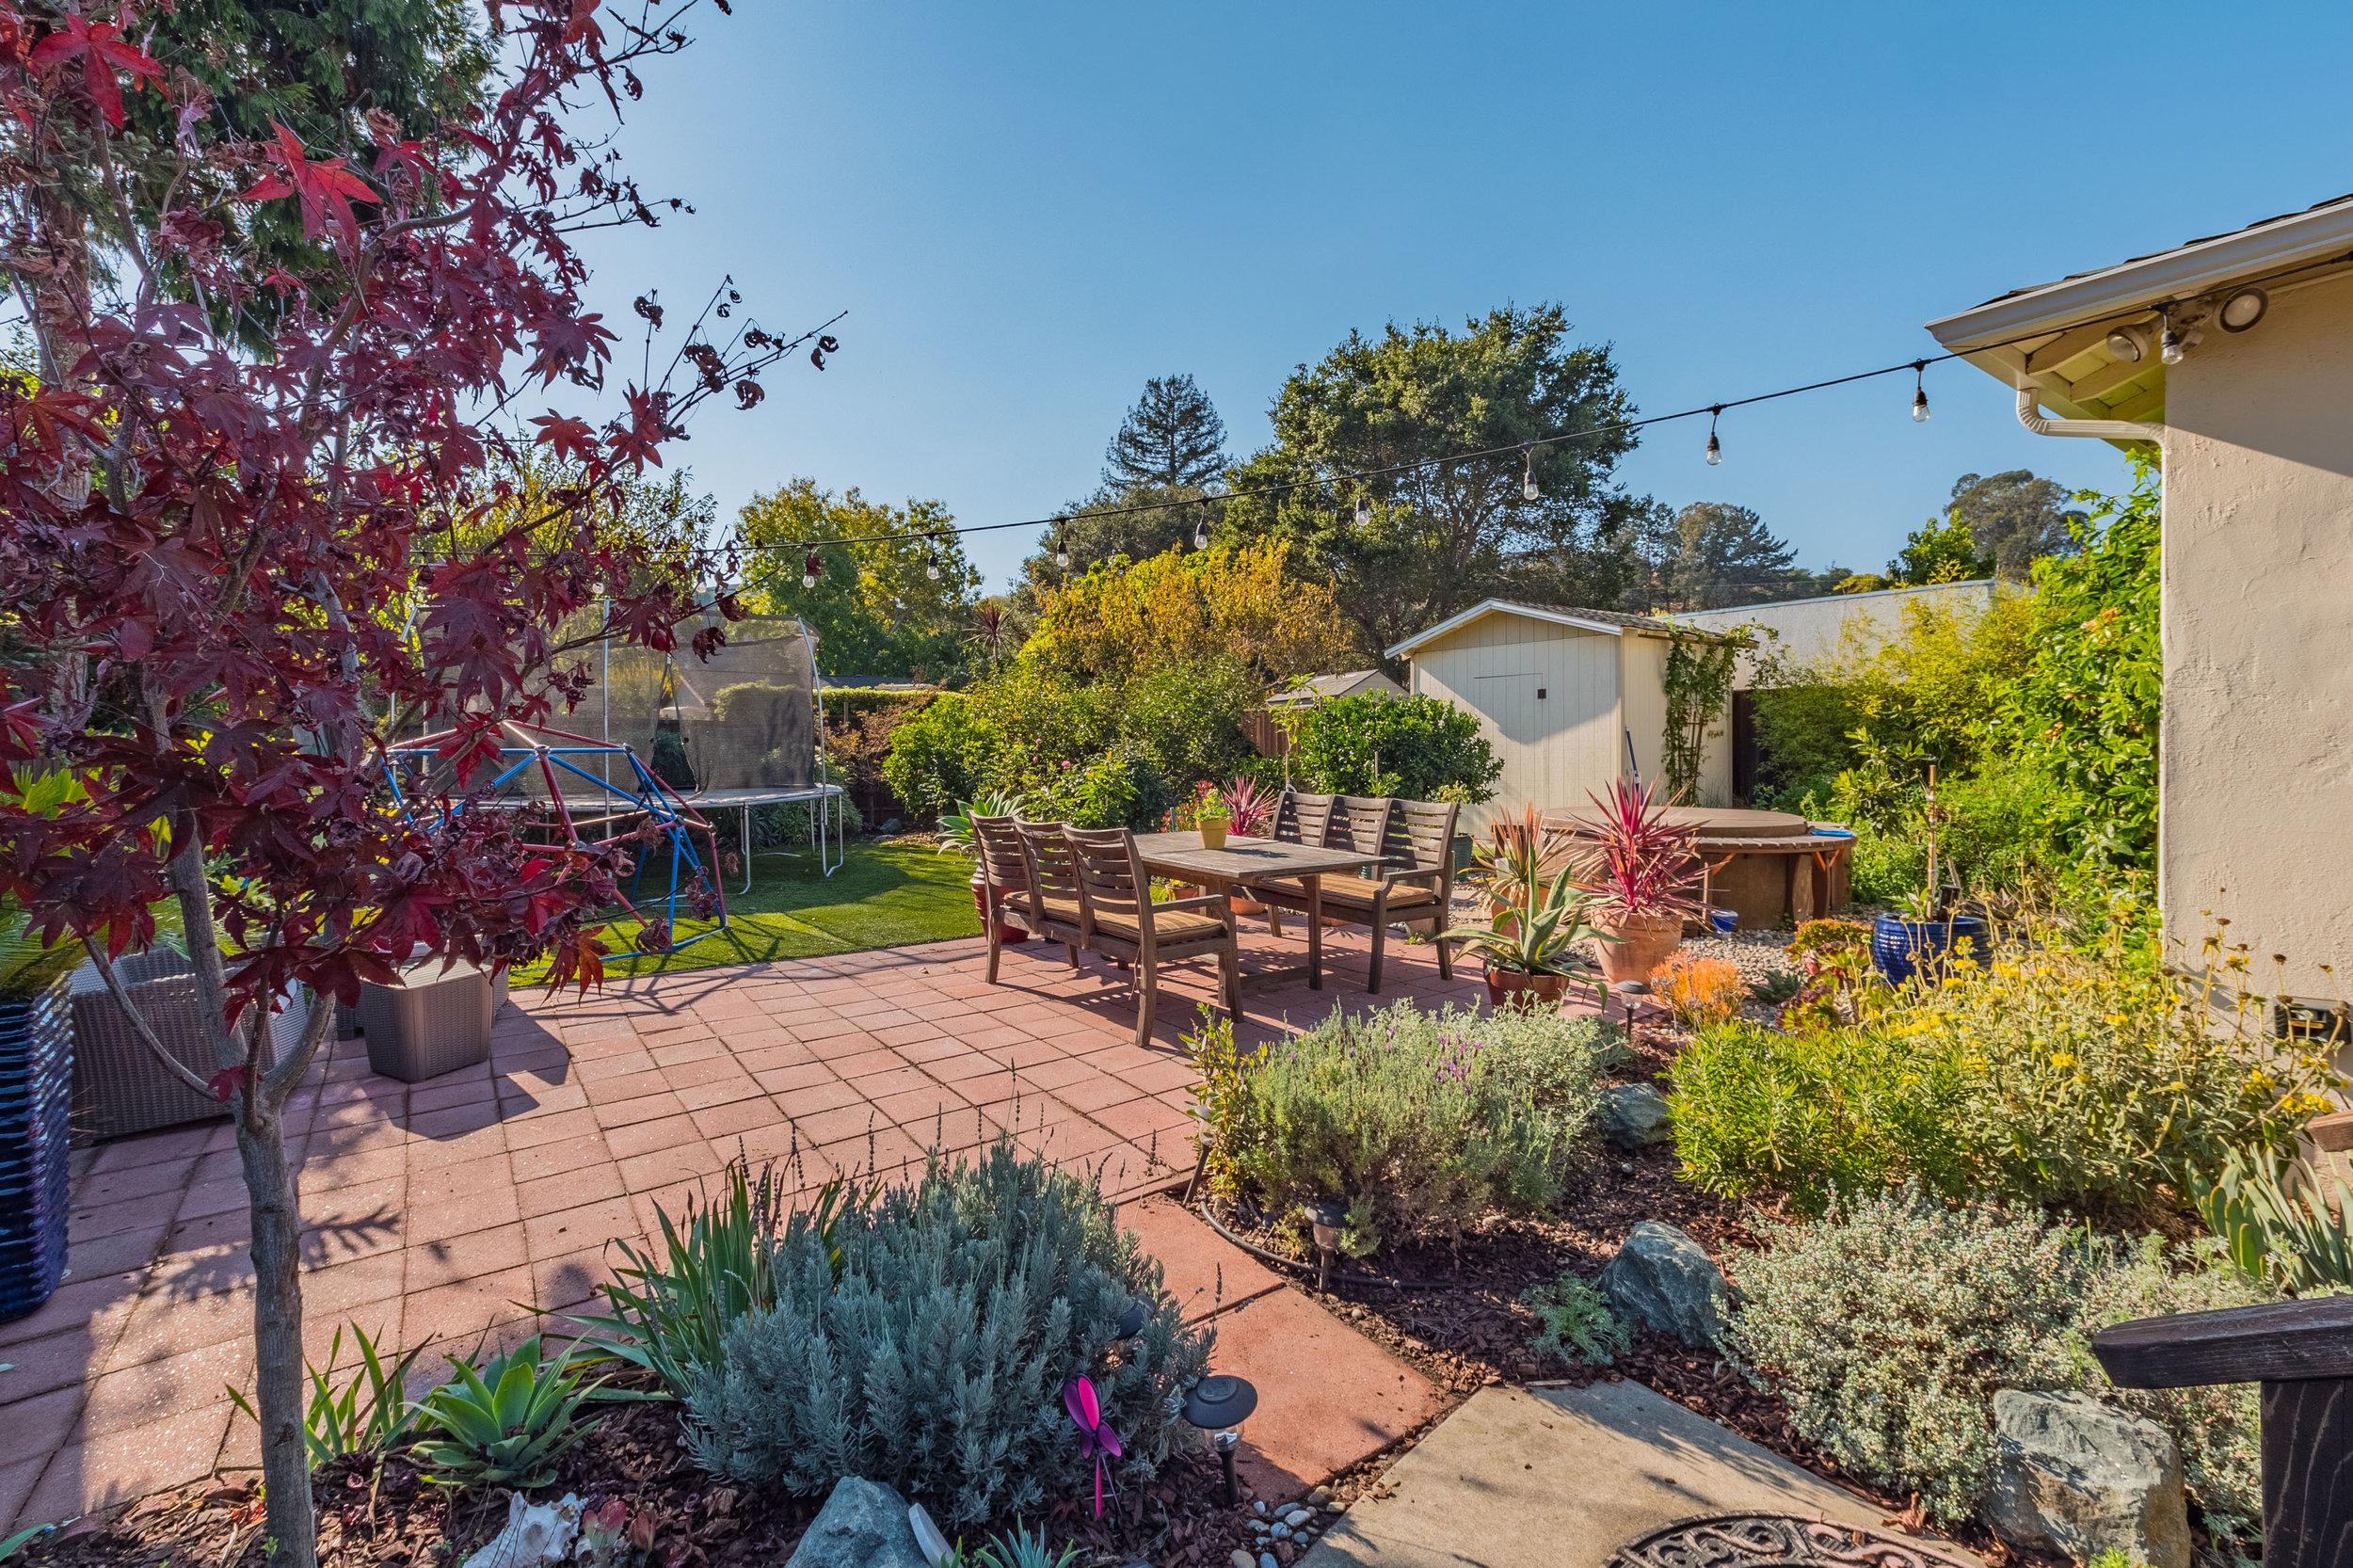 Landscaped Yard in Santa Cruz County